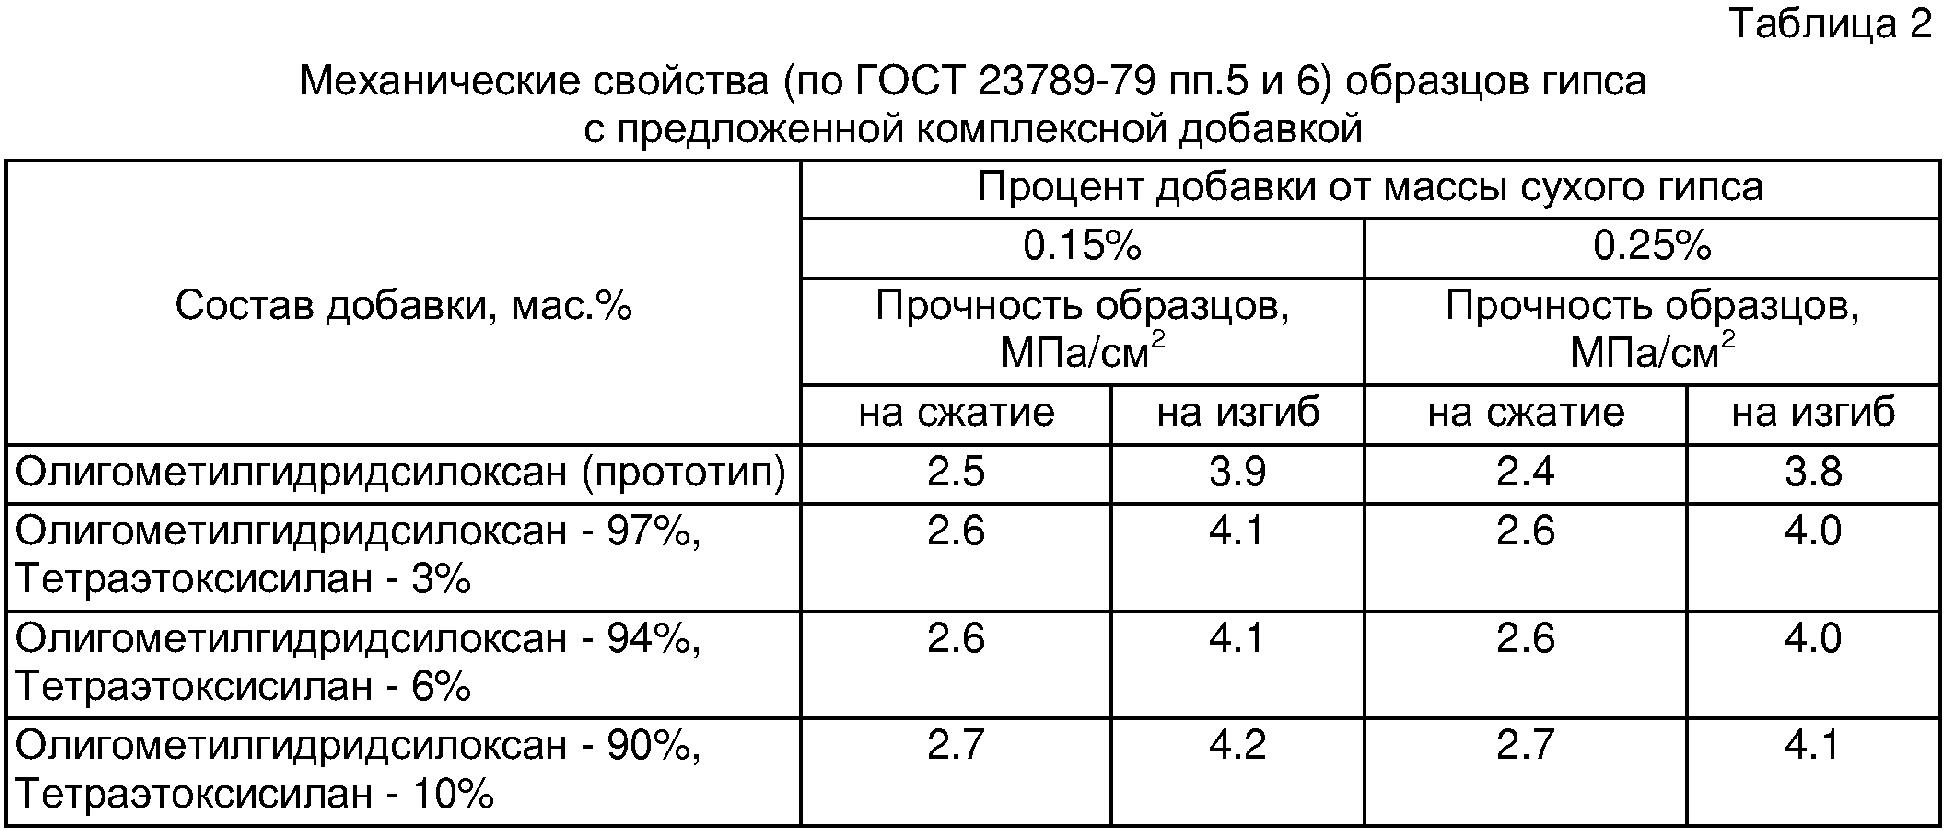 гипс вес